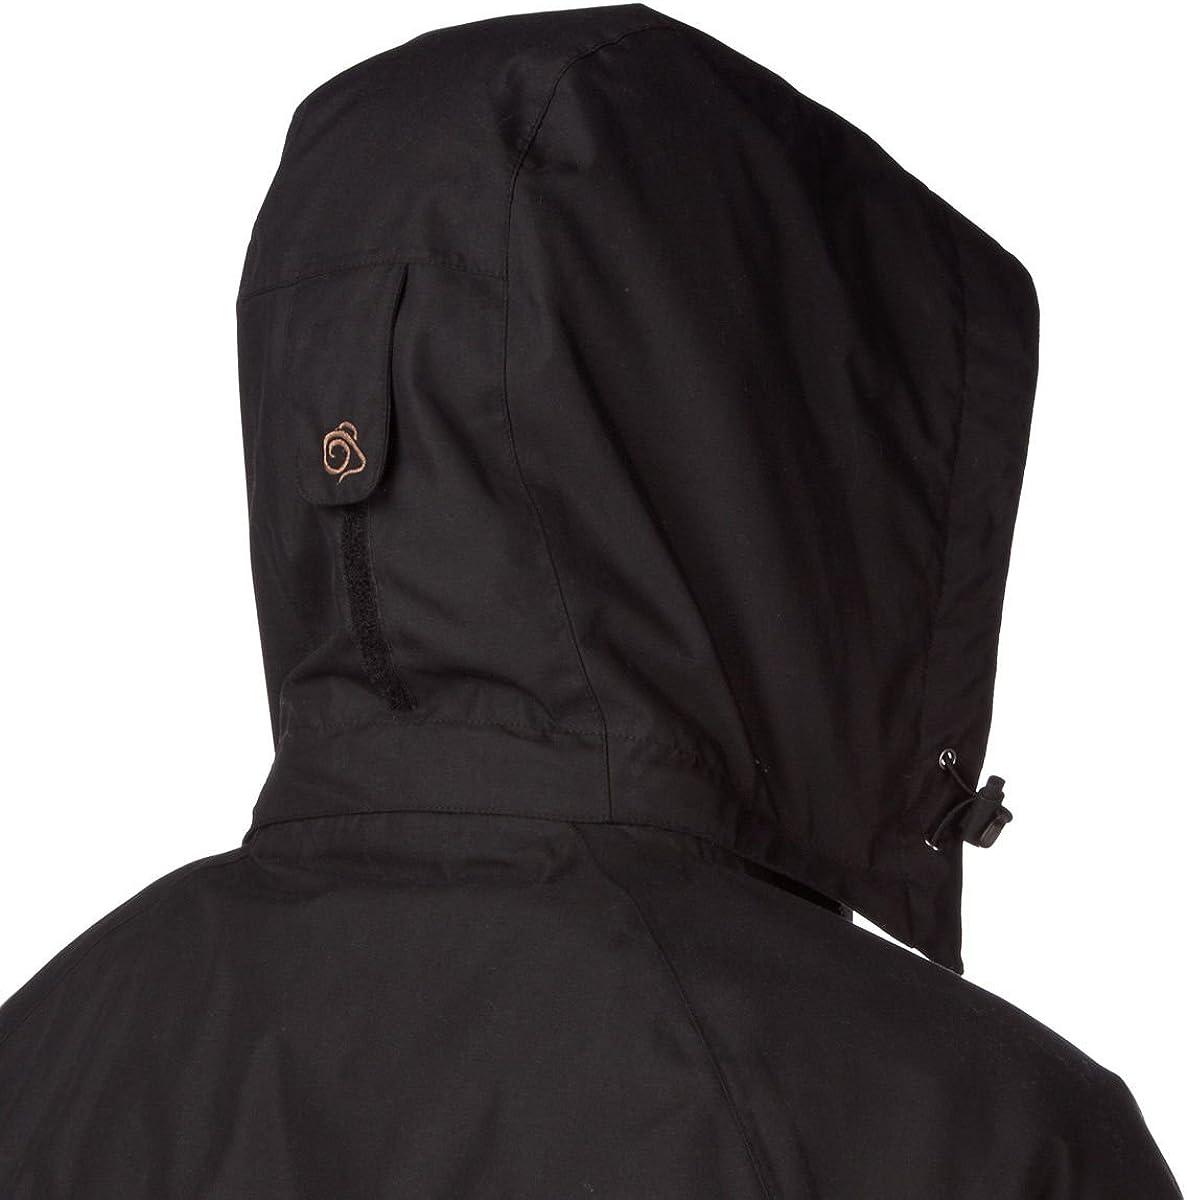 Craghoppers Mens Kiwi Jacket